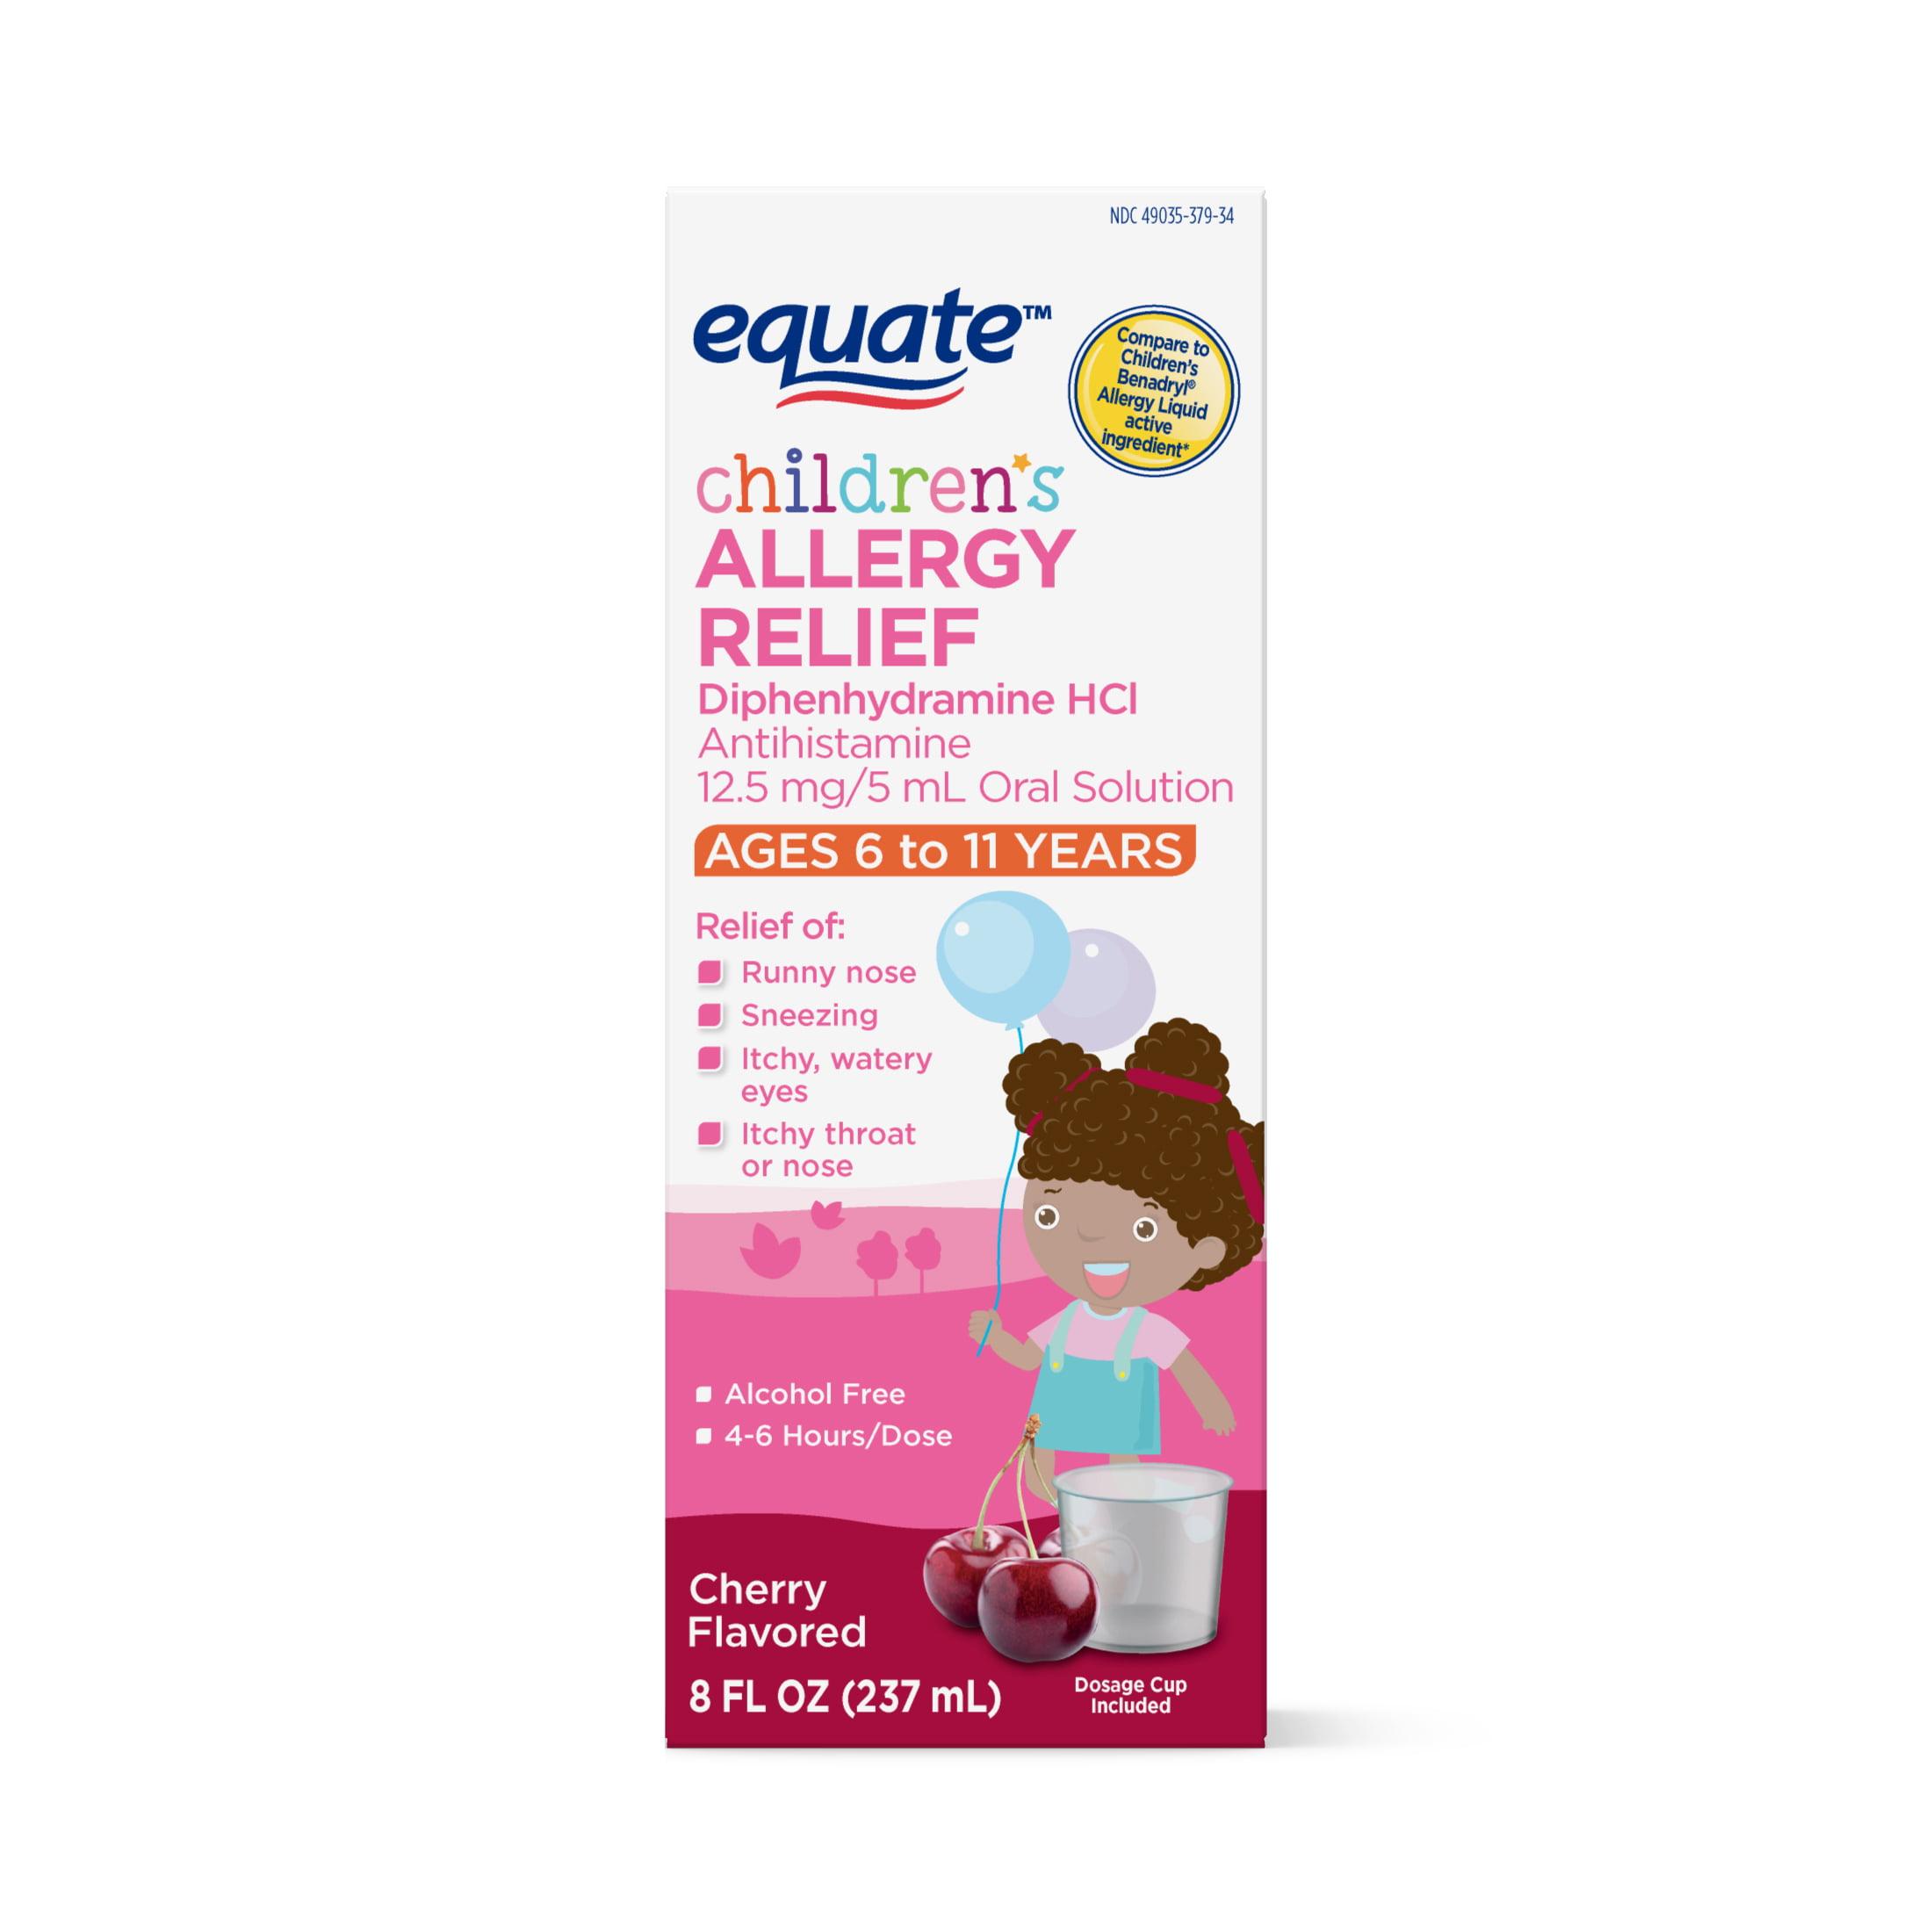 Equate Children's Allergy Relief, Cherry, 8 Fl Oz